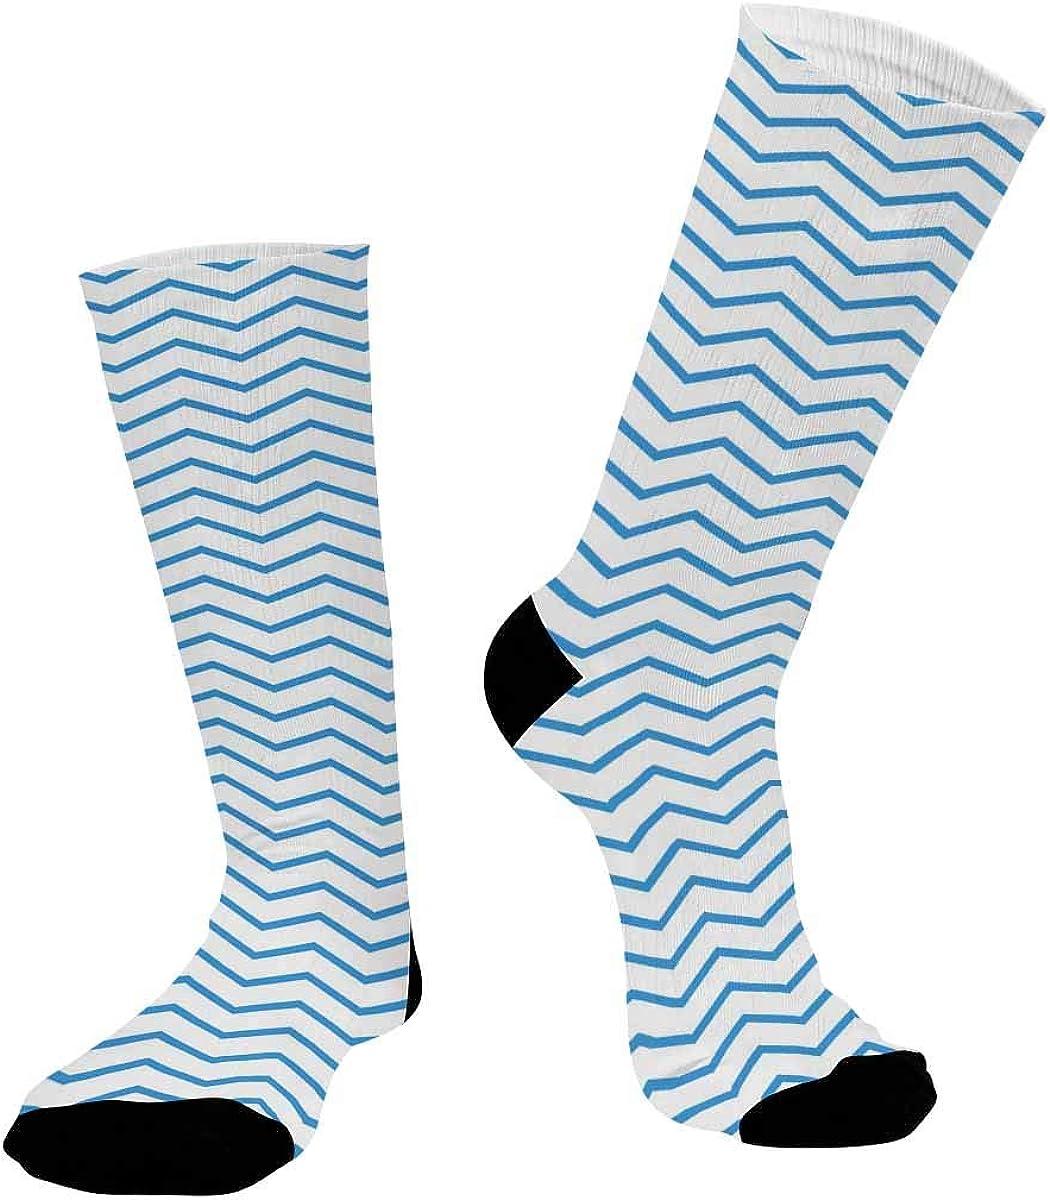 INTERESTPRINT Sublimated Crew Socks, Athletic Dress Socks Monochrome Geometric